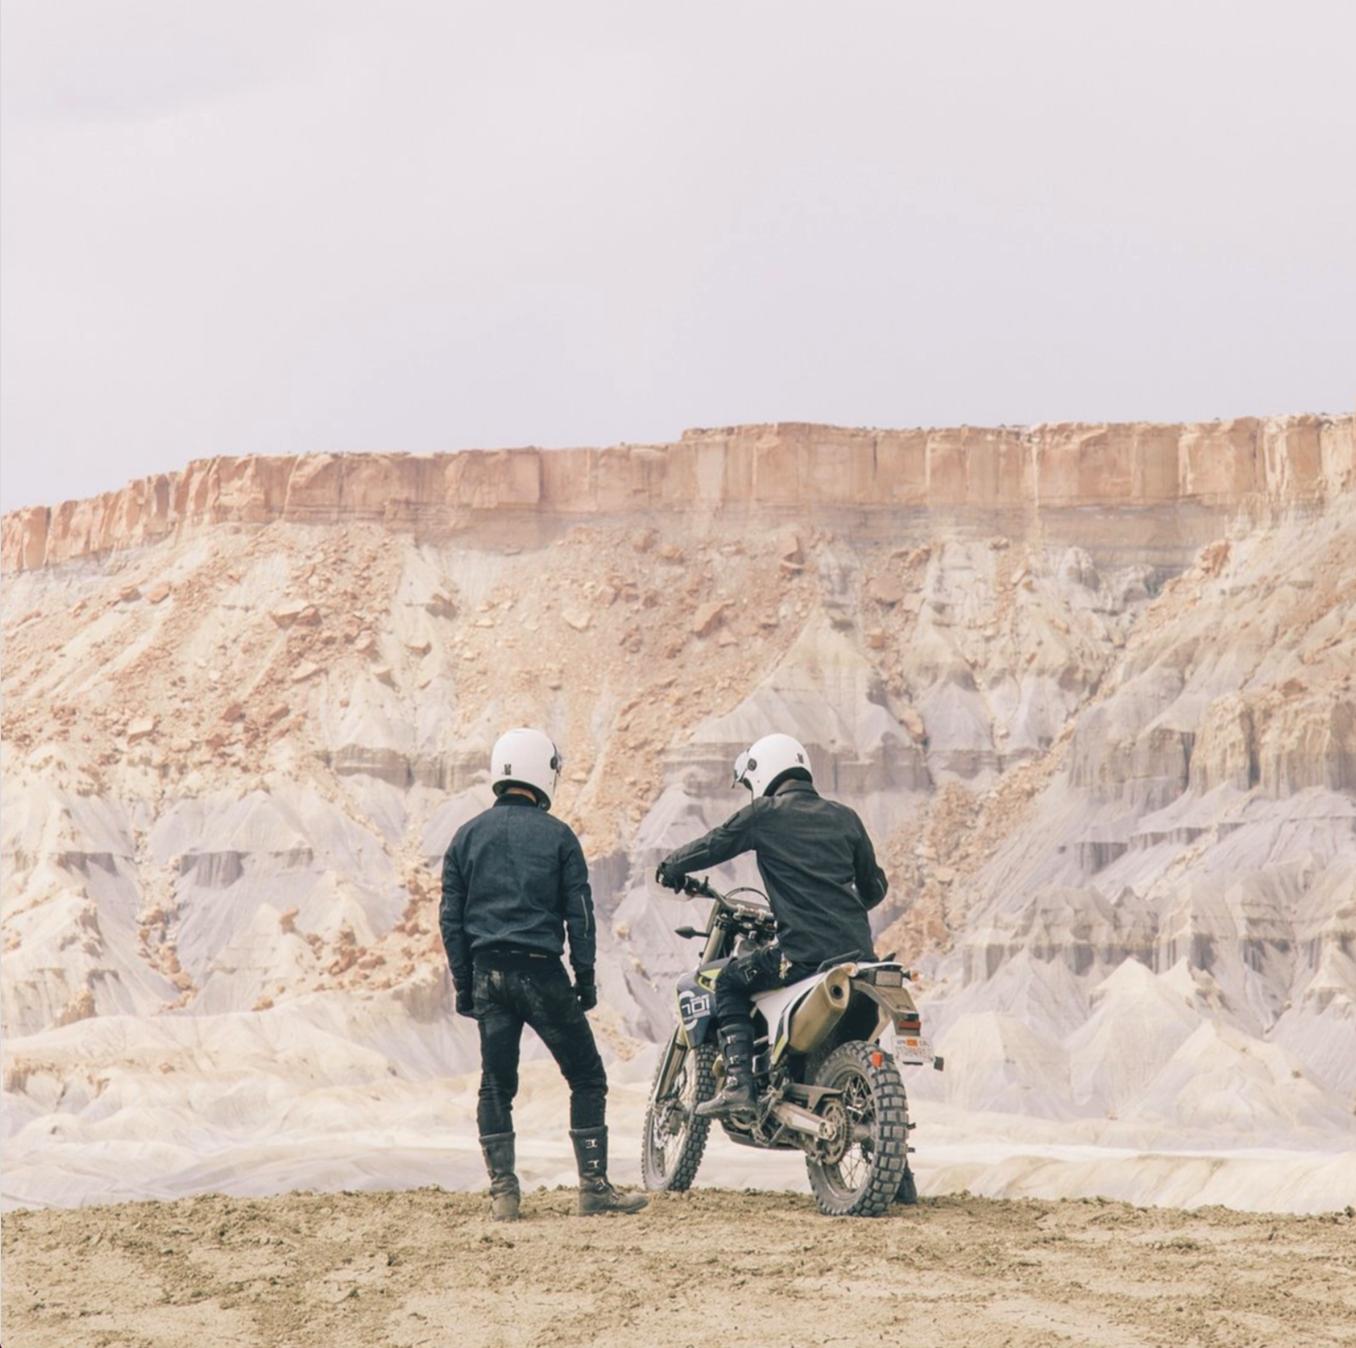 David + Andrew - Cafe racers of Instagram